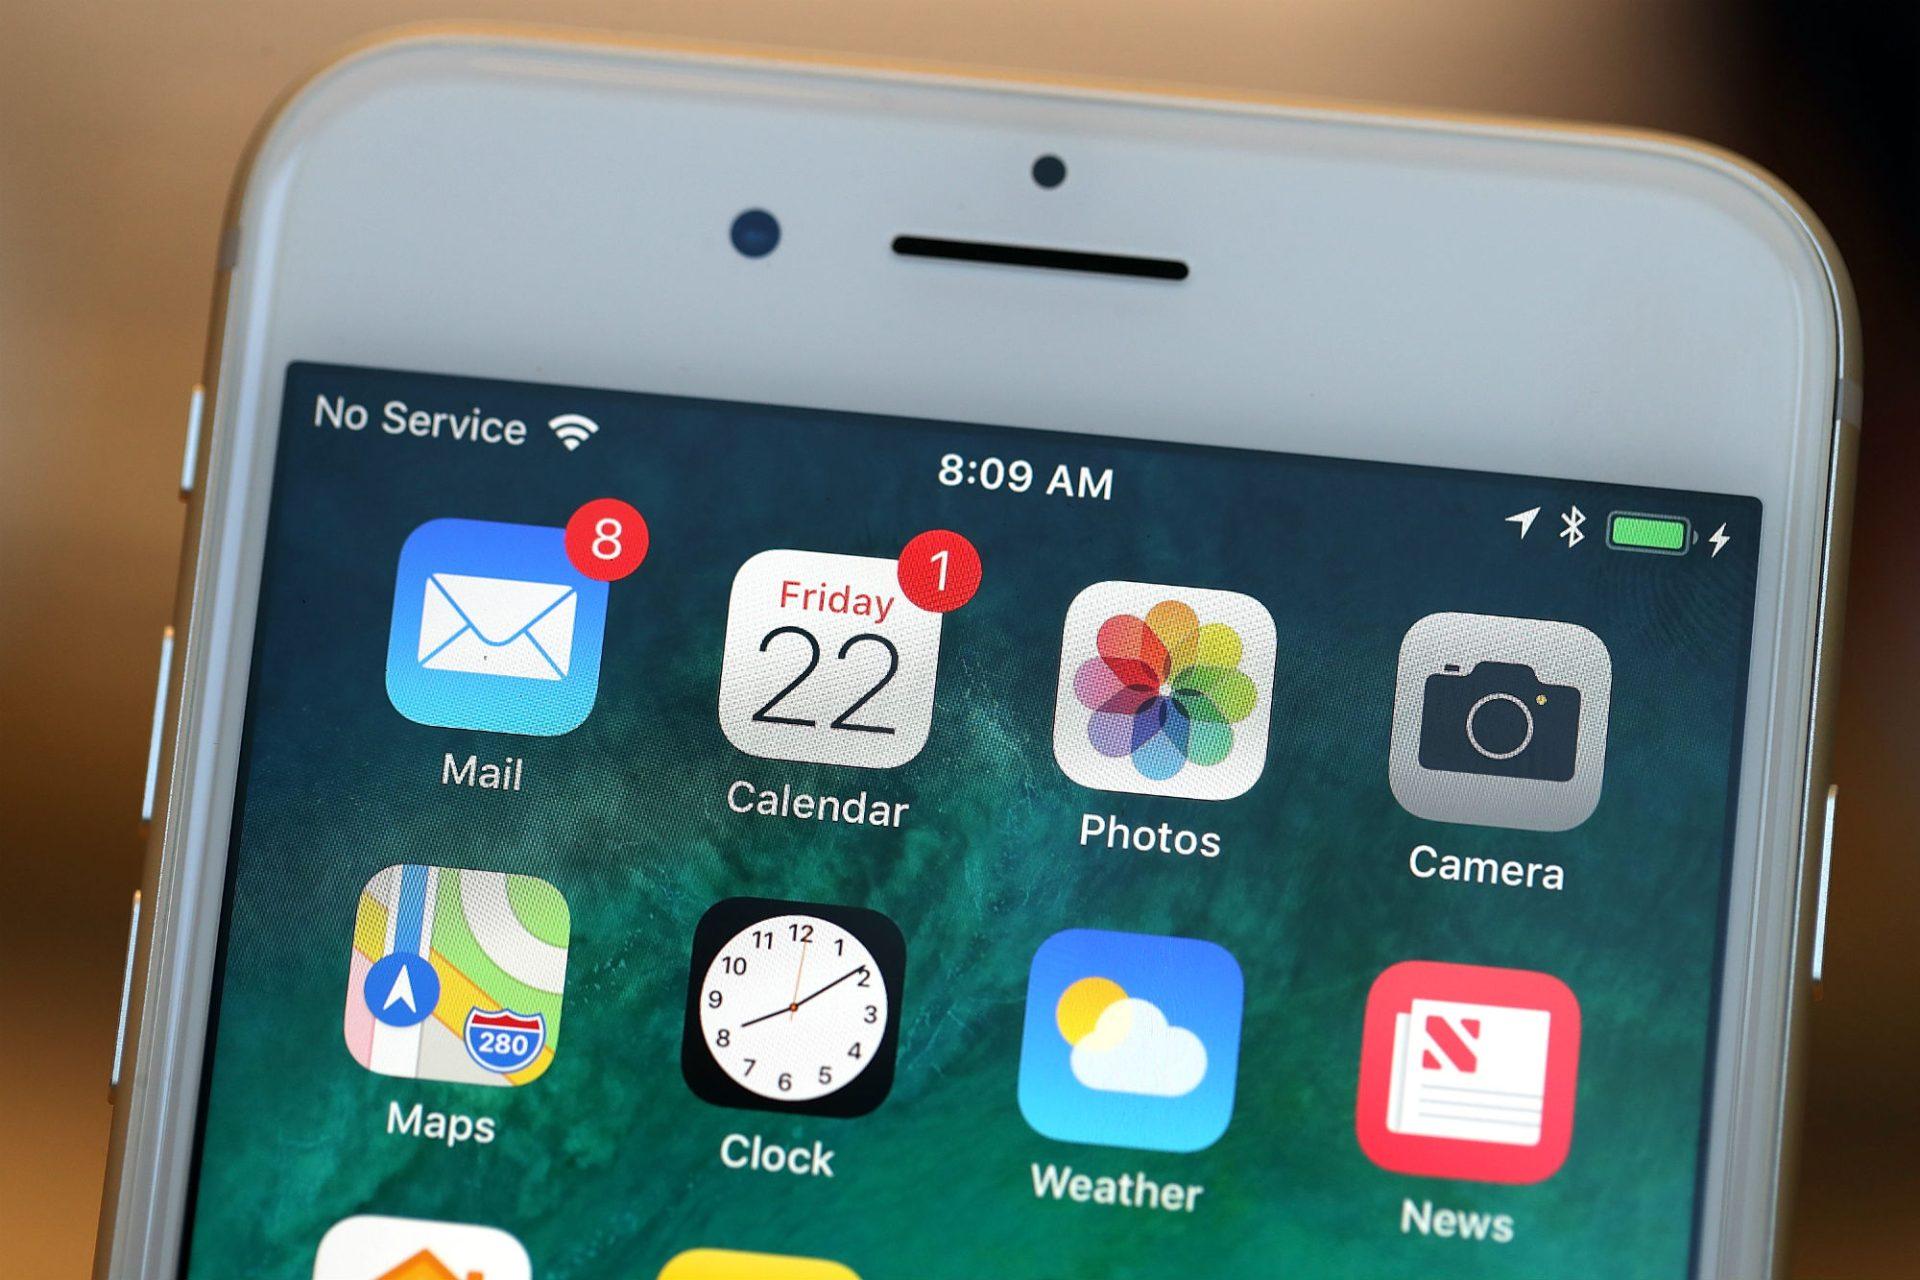 How to get rid of the invalid SIM error on iPhone | UnlockUnit